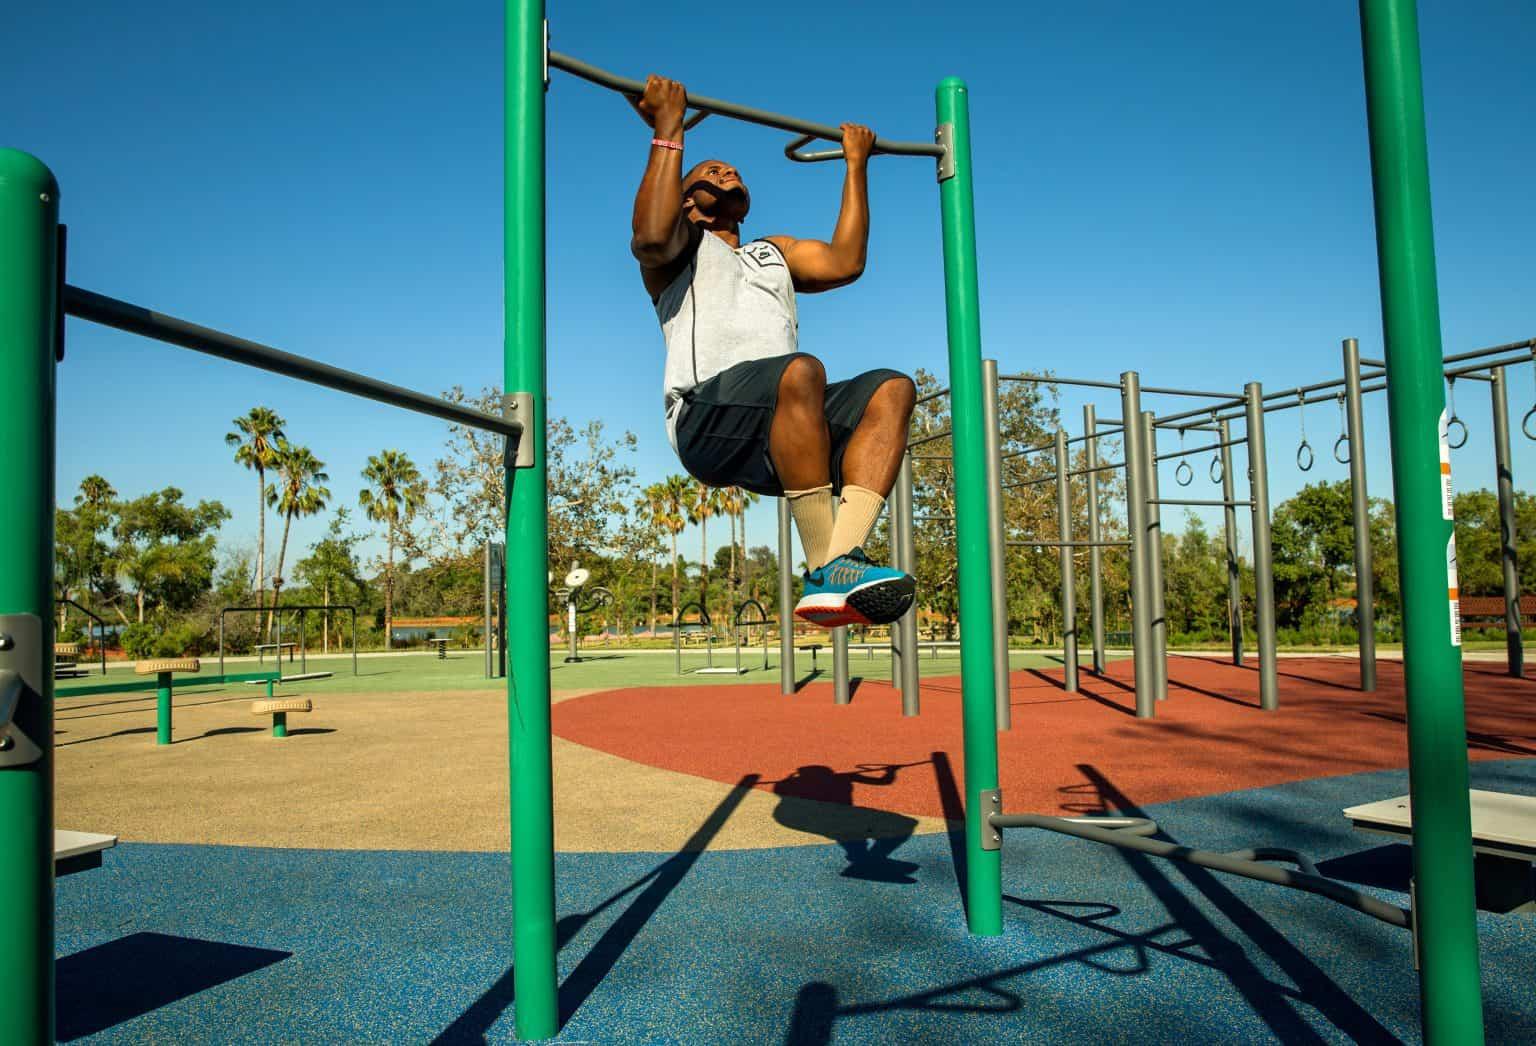 outdoor-fitness-equipment_49644071042_o-1536x1046